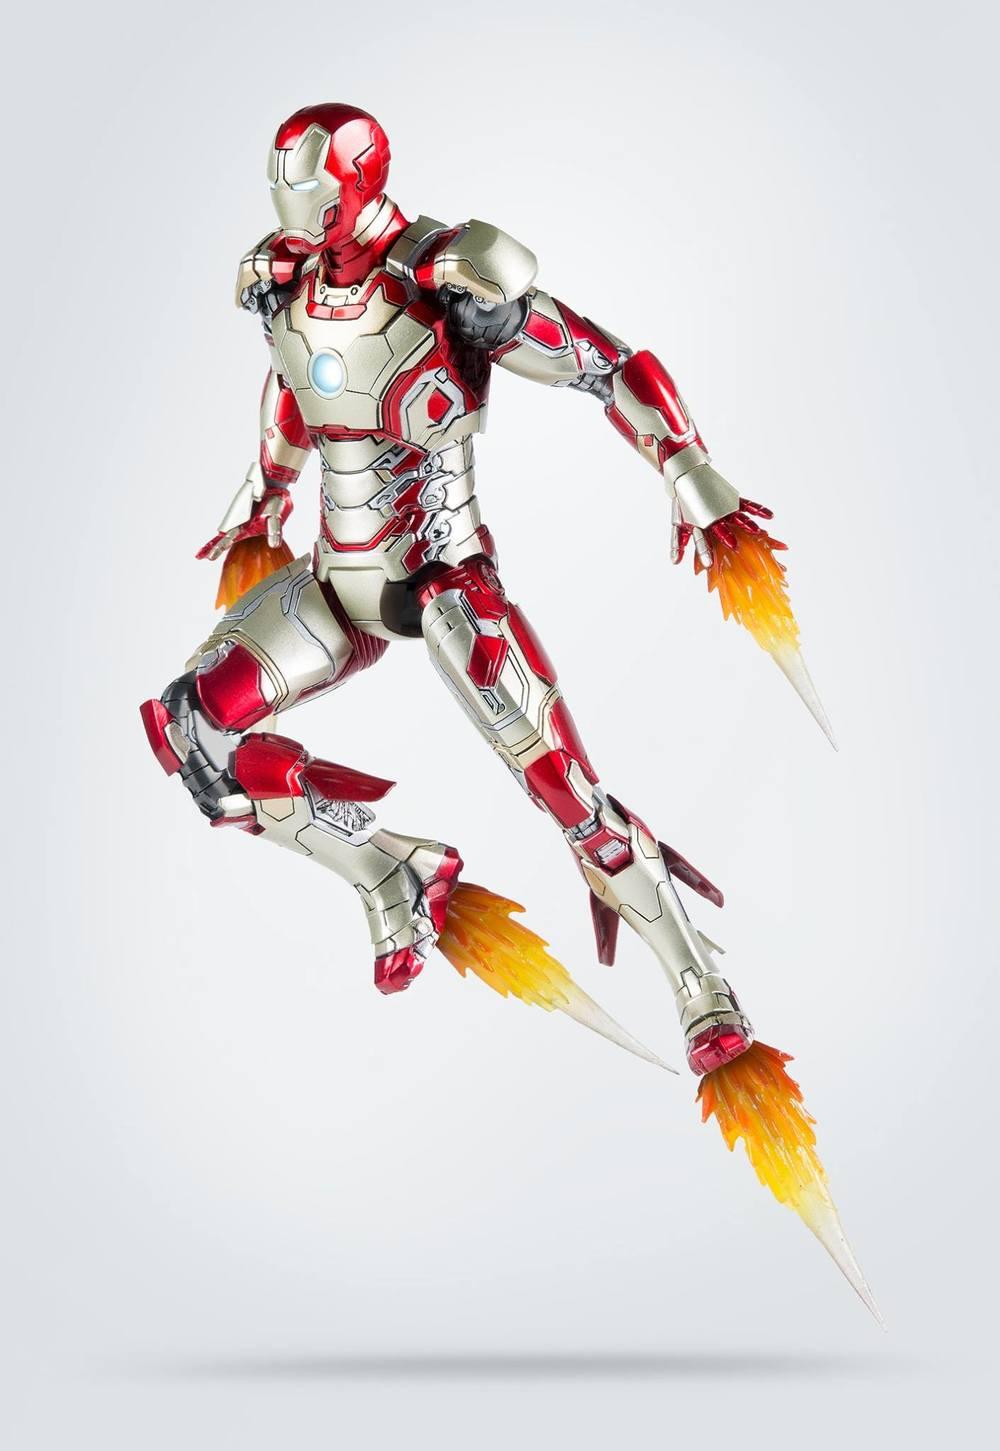 Comicave-Iron-Man-Mark-42-Armor-002 (1).jpg